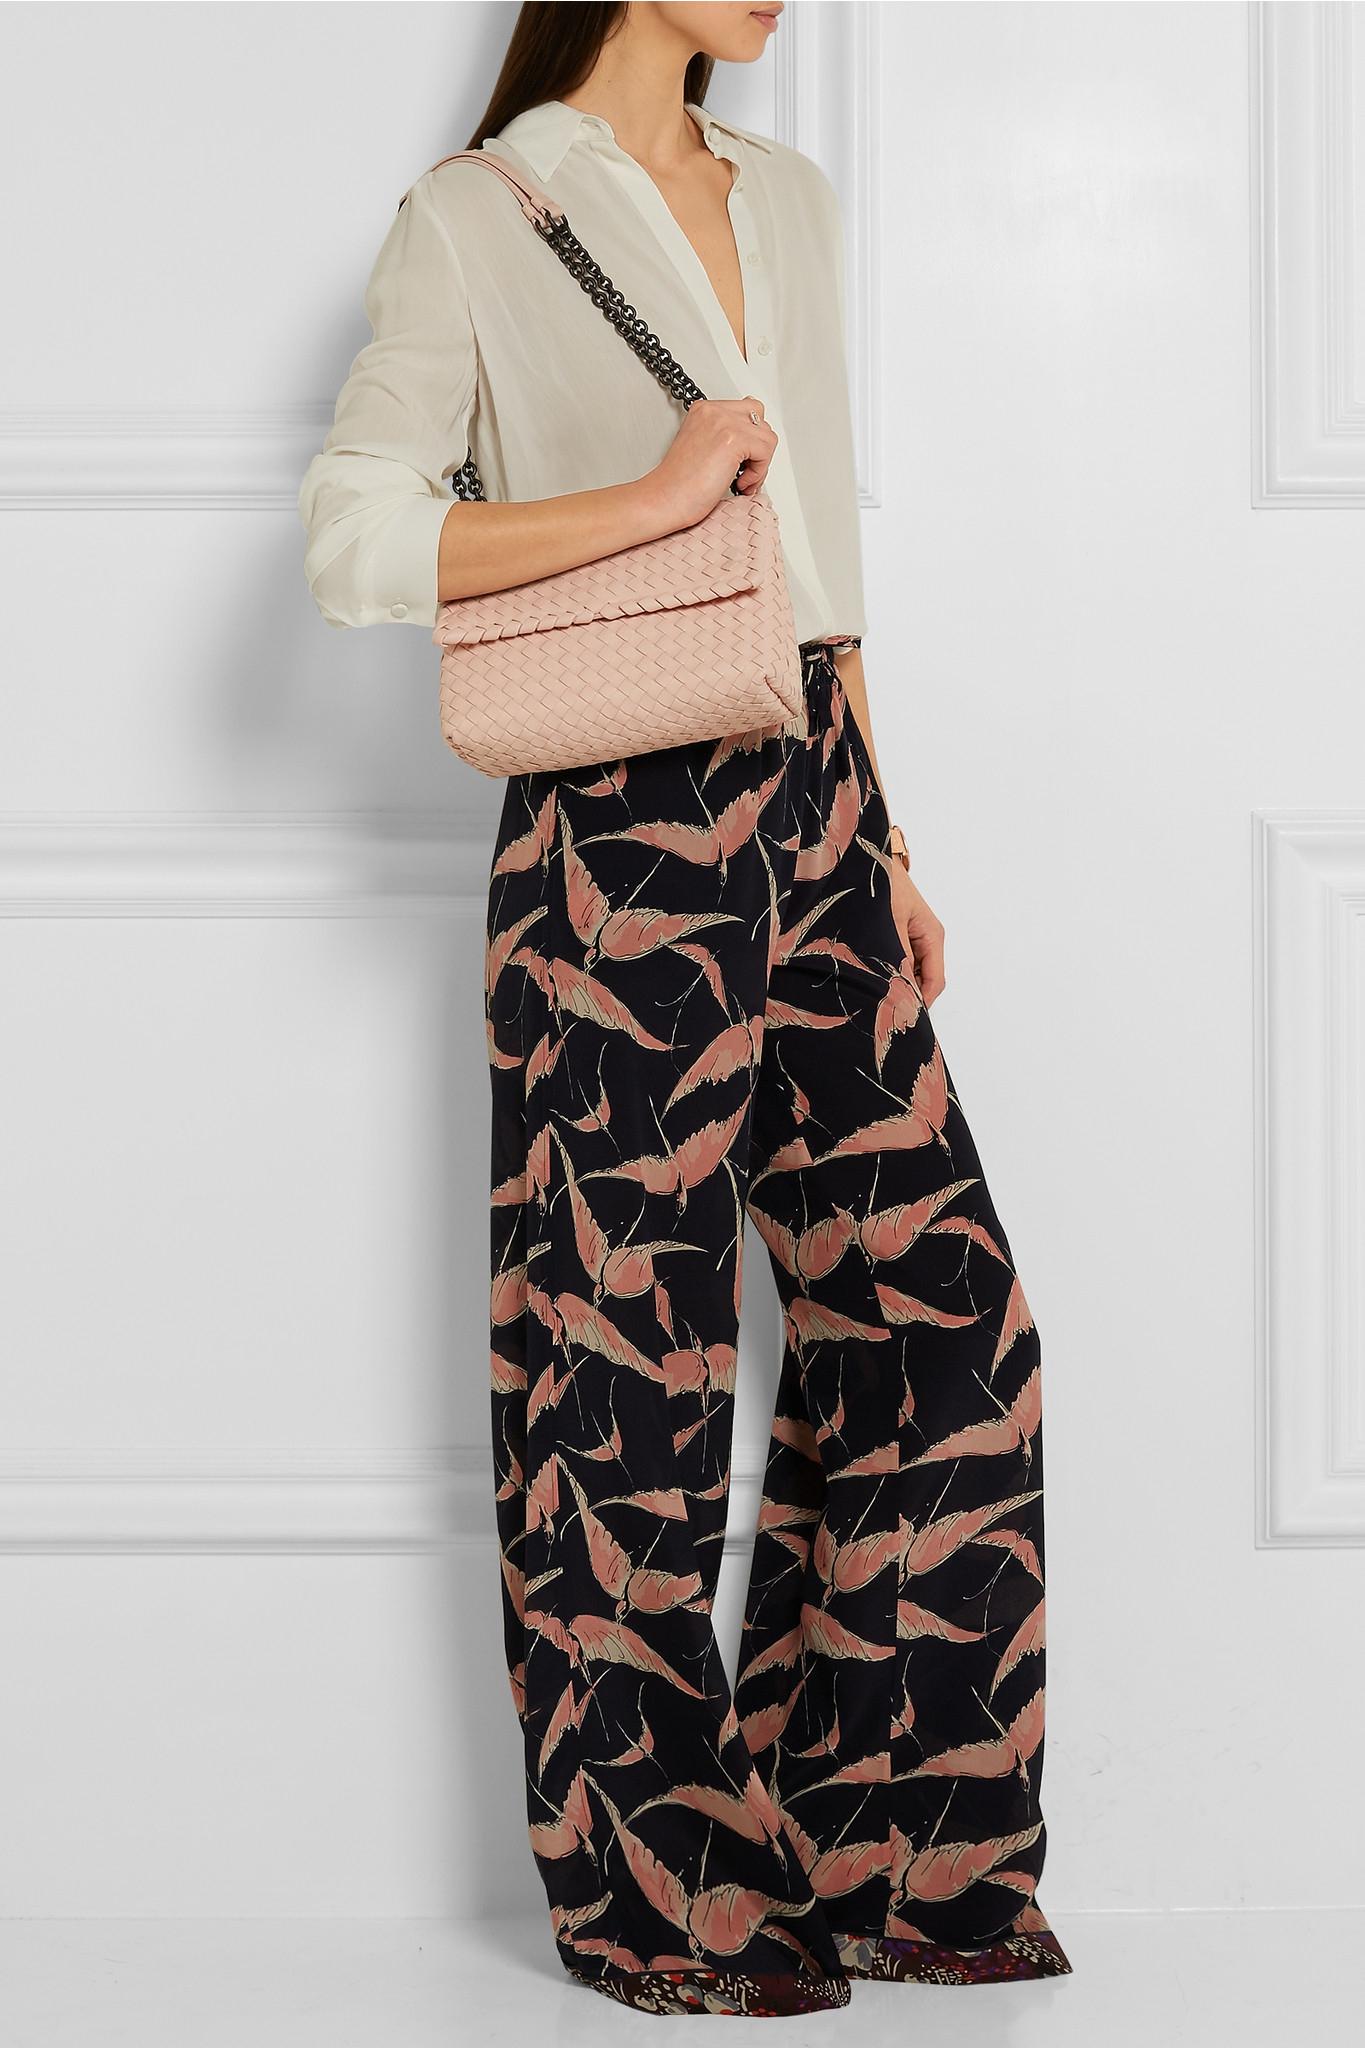 Bottega Veneta Small Olimpia Bag